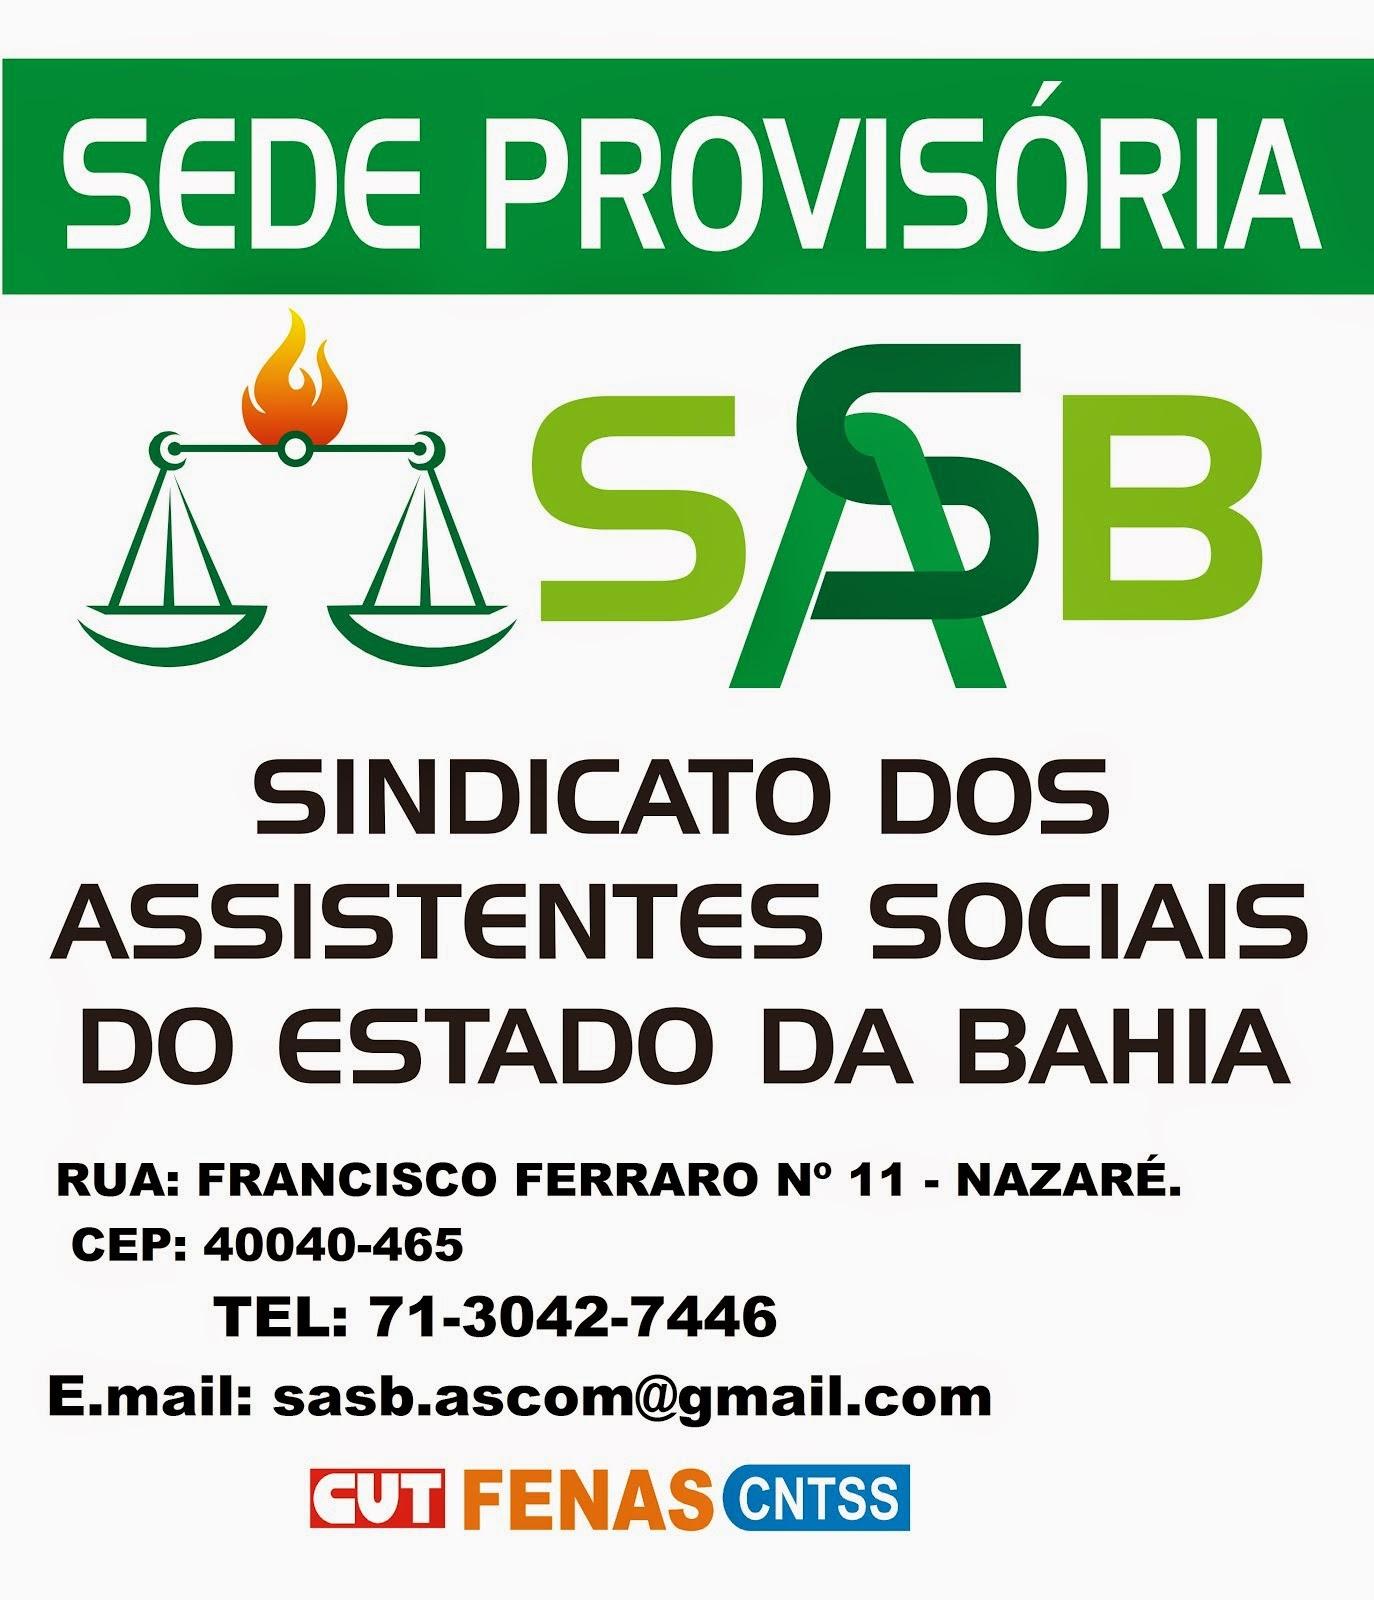 SEDE PROVISÓRIA DO SASB